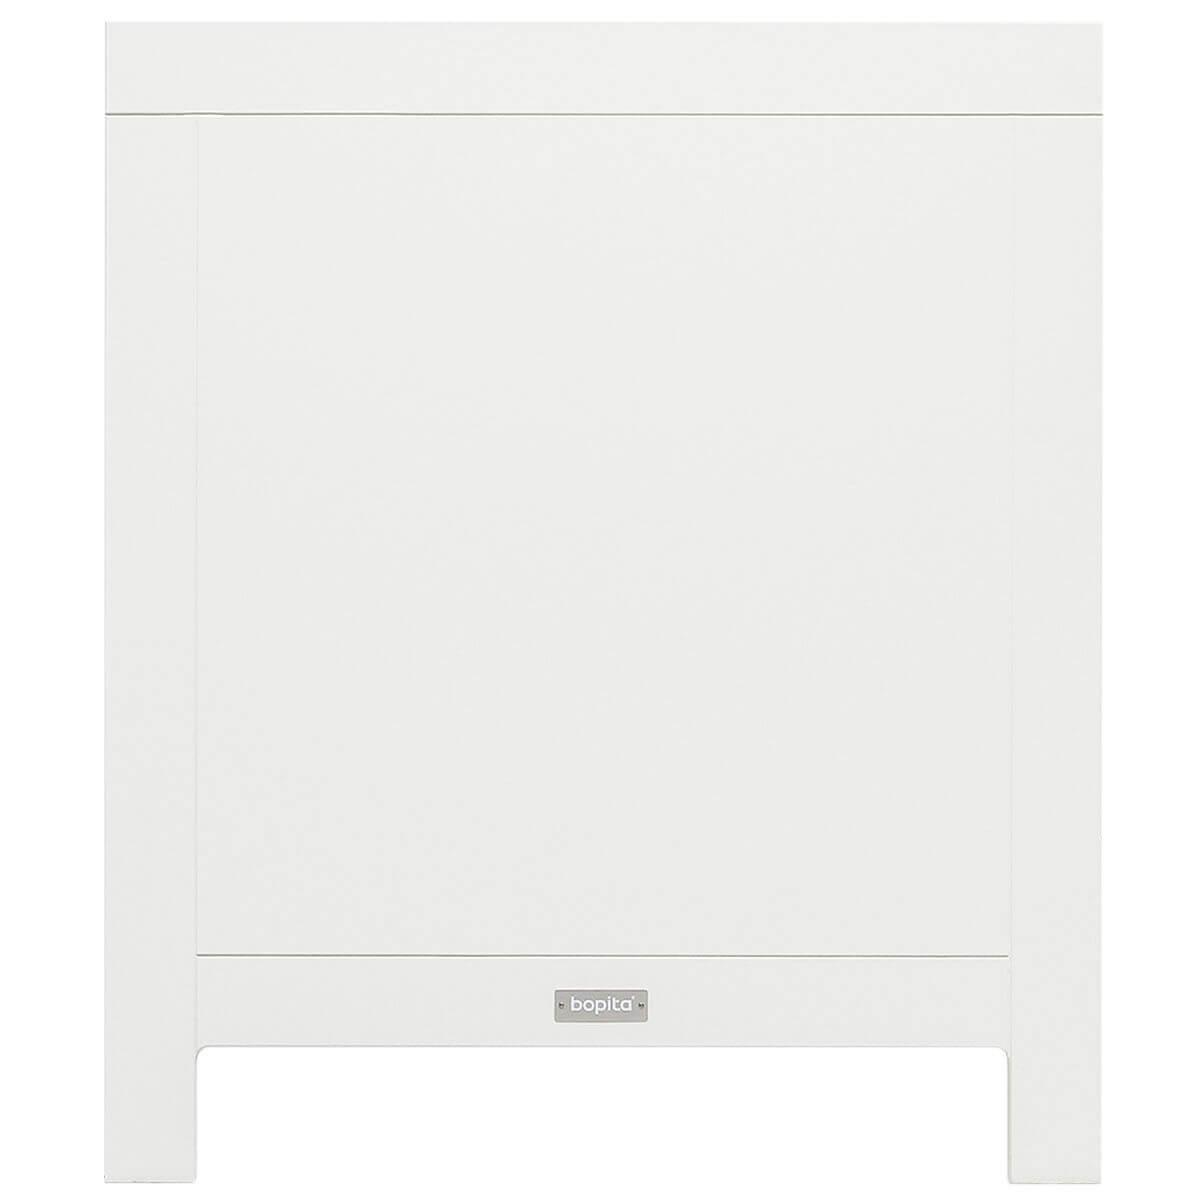 Lit 60x120cm THIJN Bopita blanc